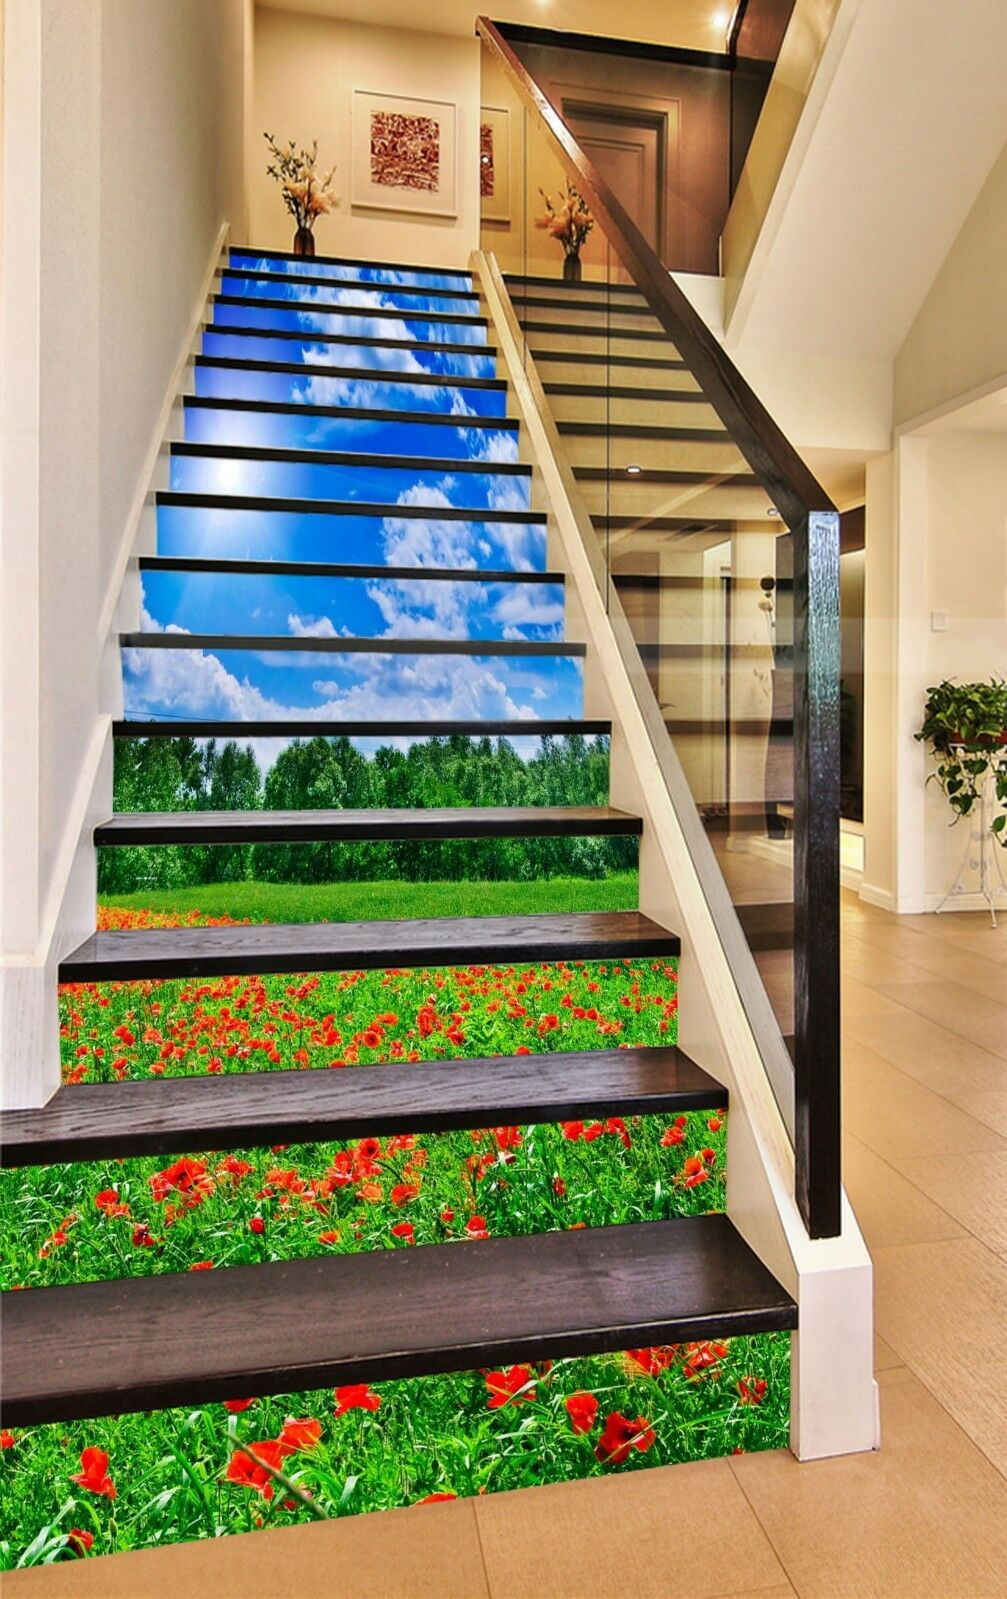 3D Flowers Field 2 Stair Risers Decoration Photo Mural Vinyl Decal Wallpaper UK